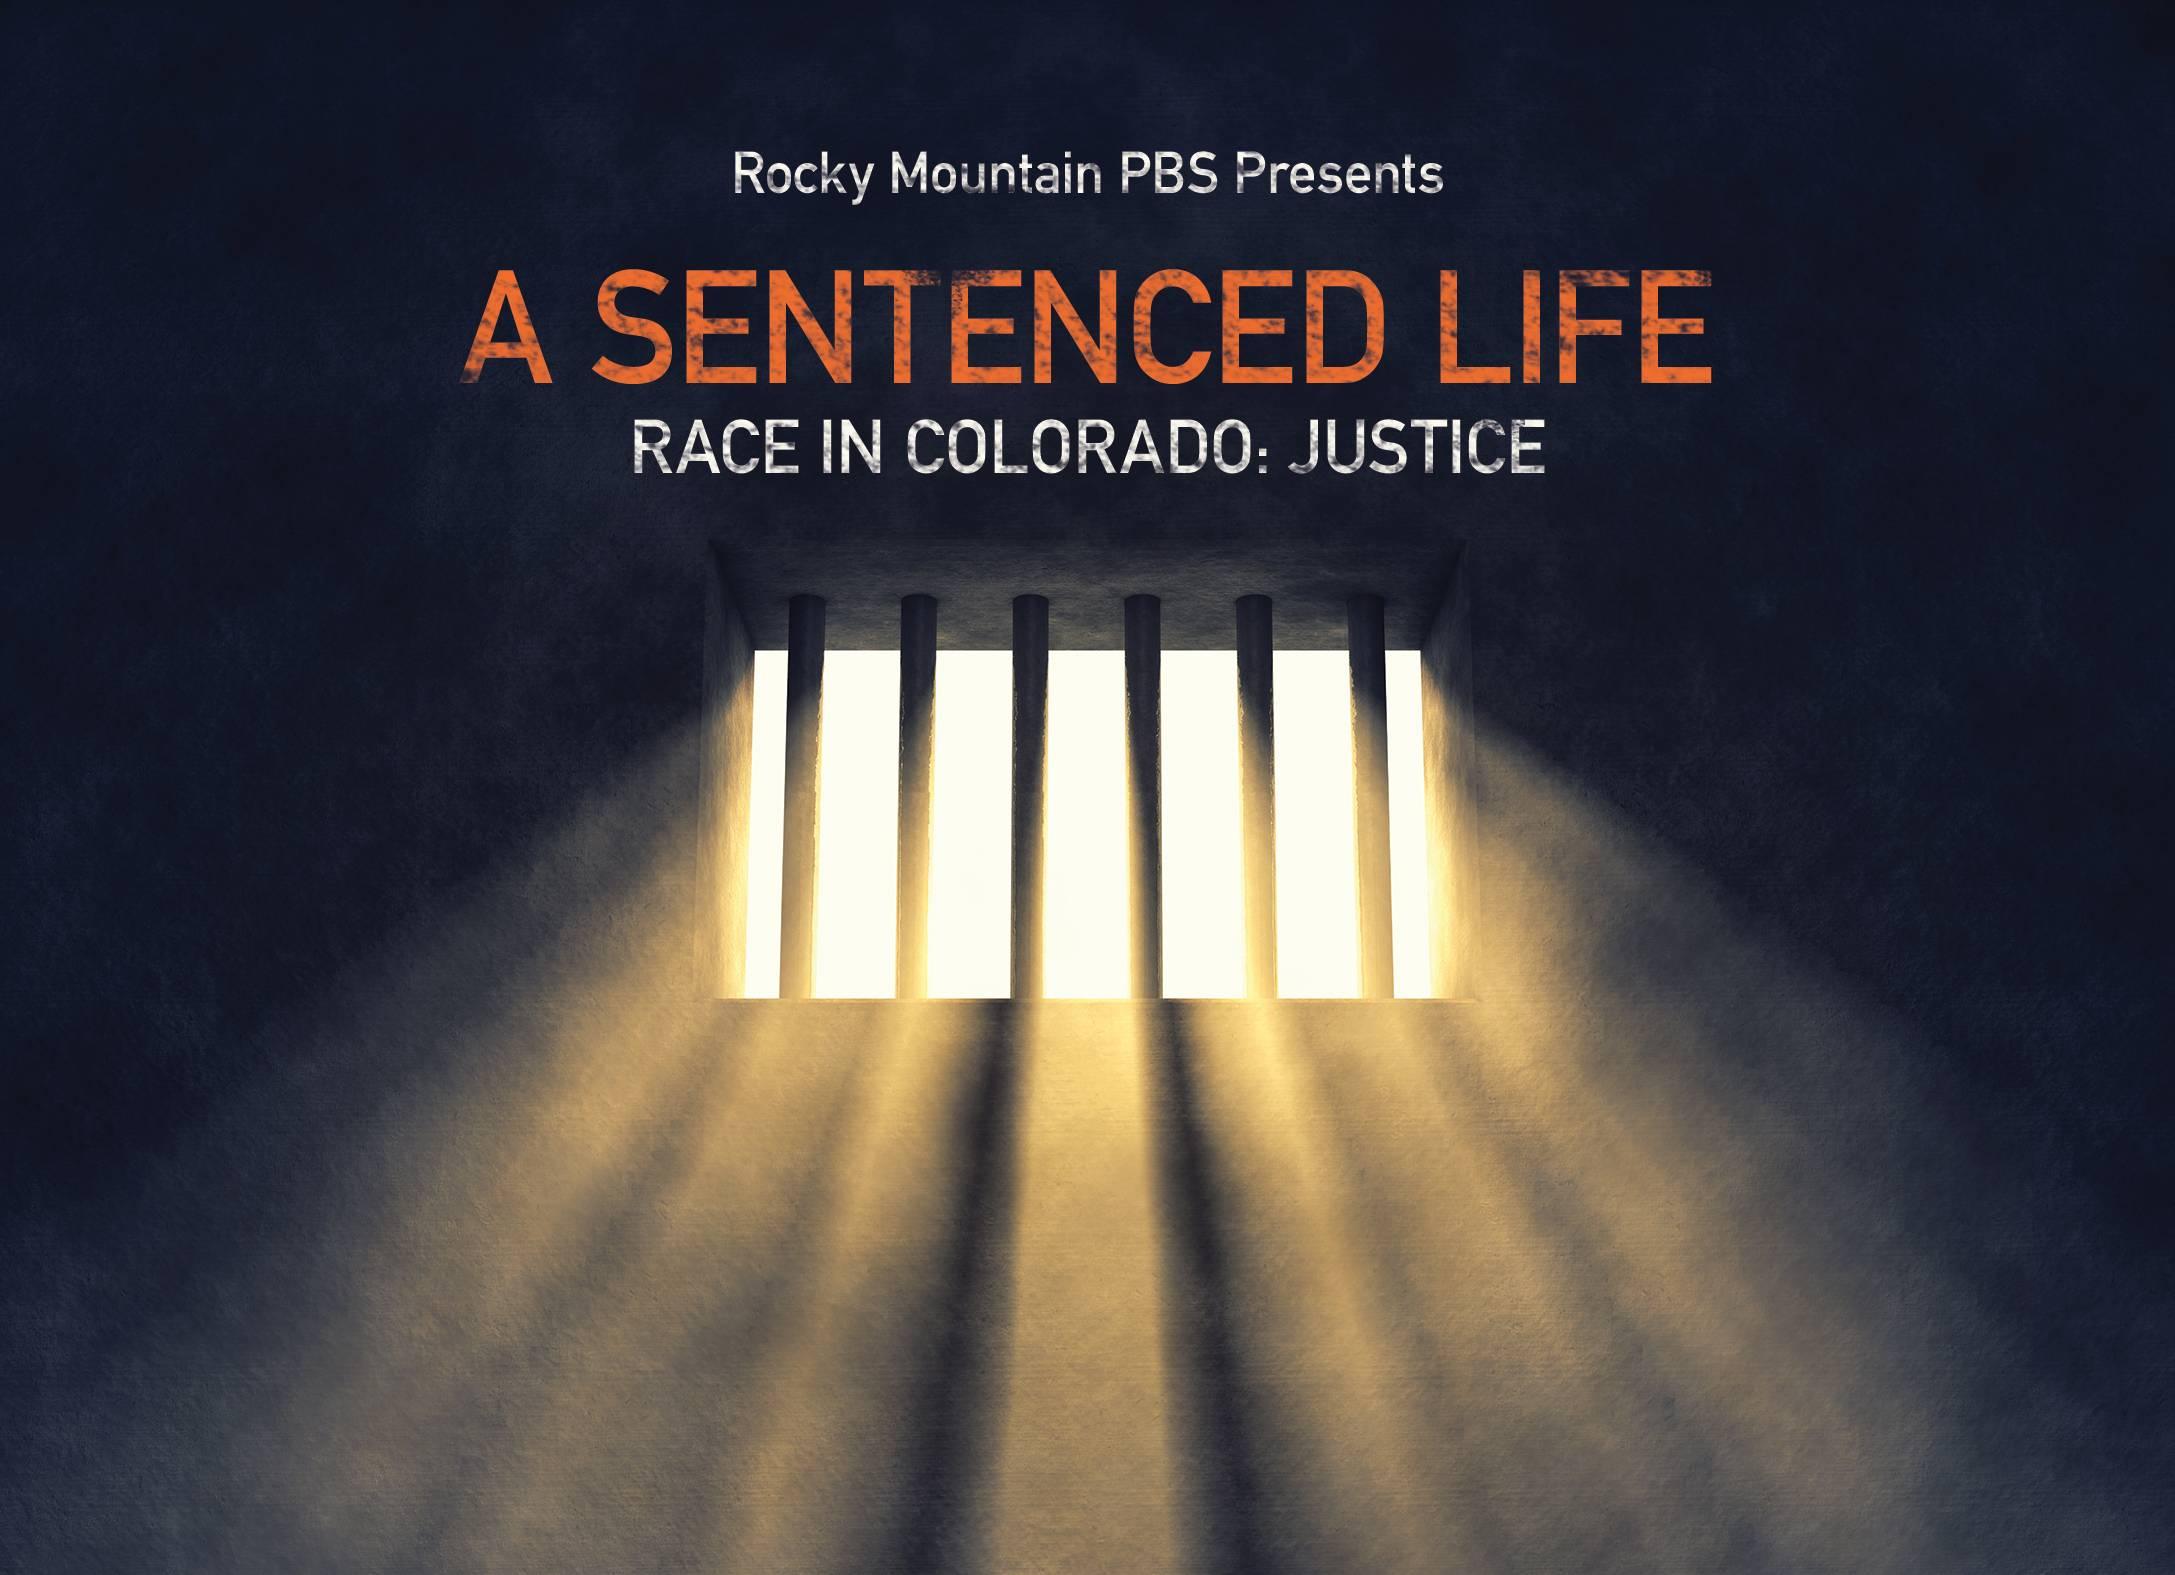 A Sentenced Life